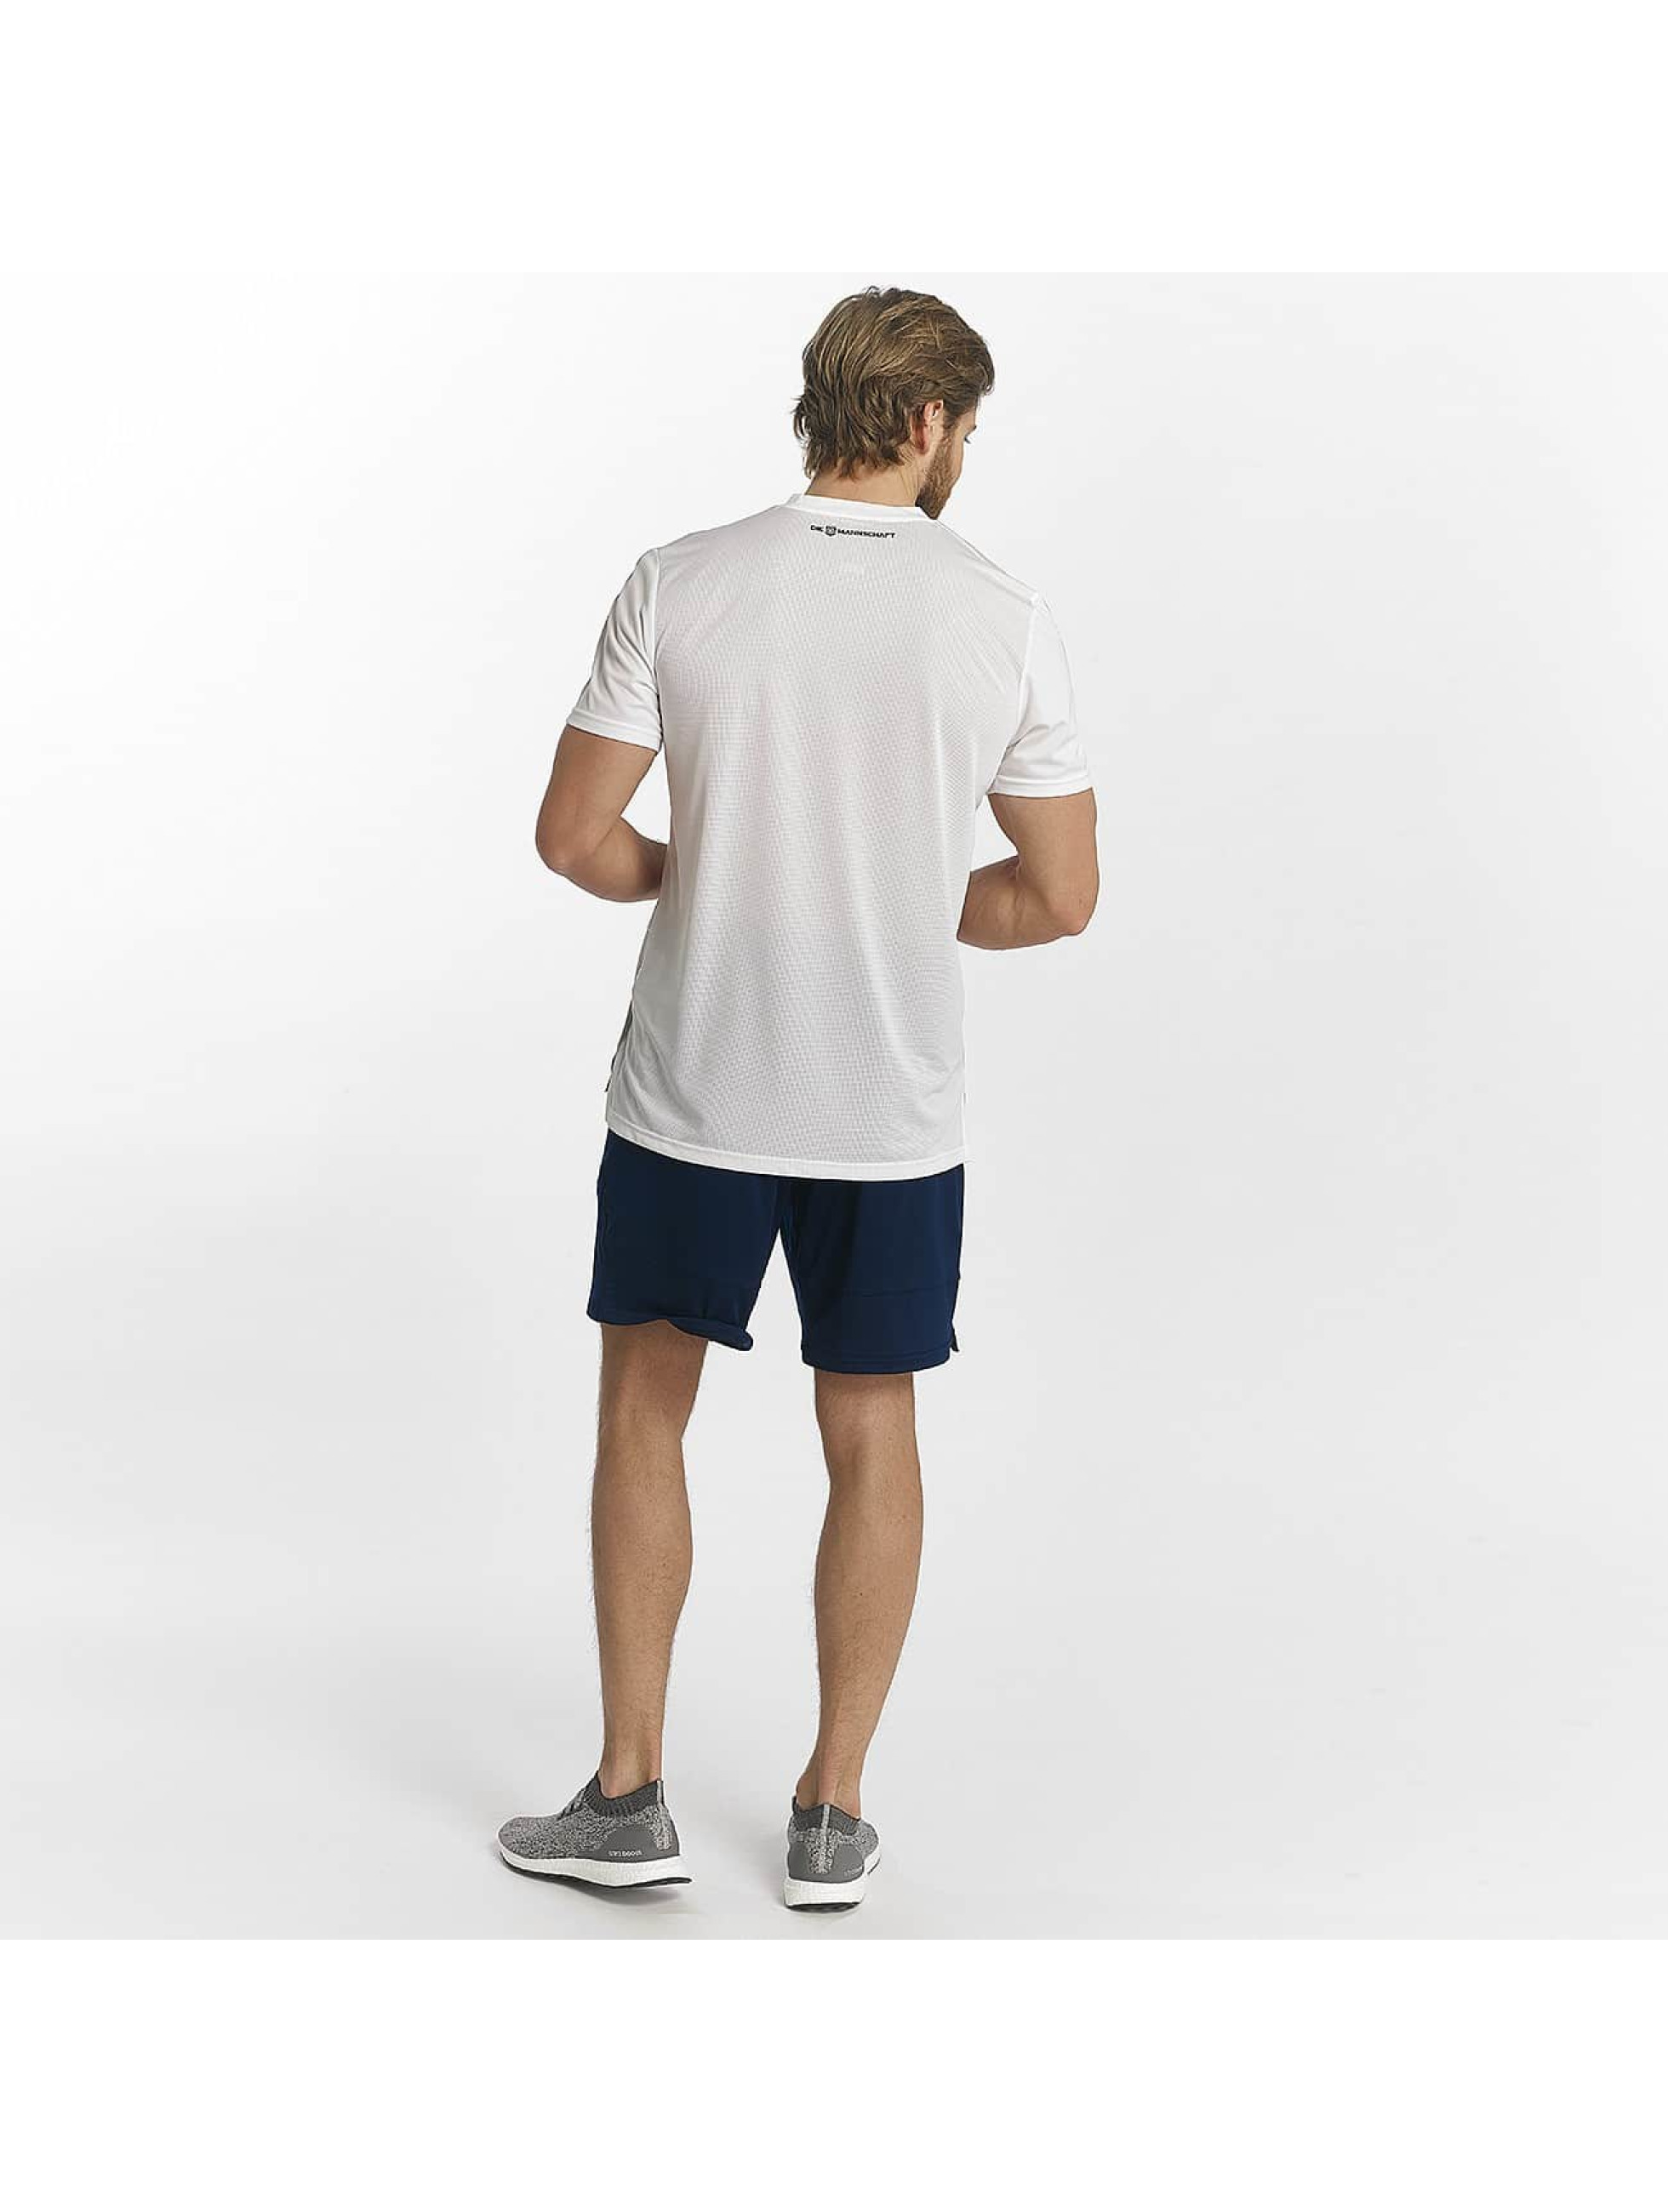 adidas Performance Jersey DFB Training white